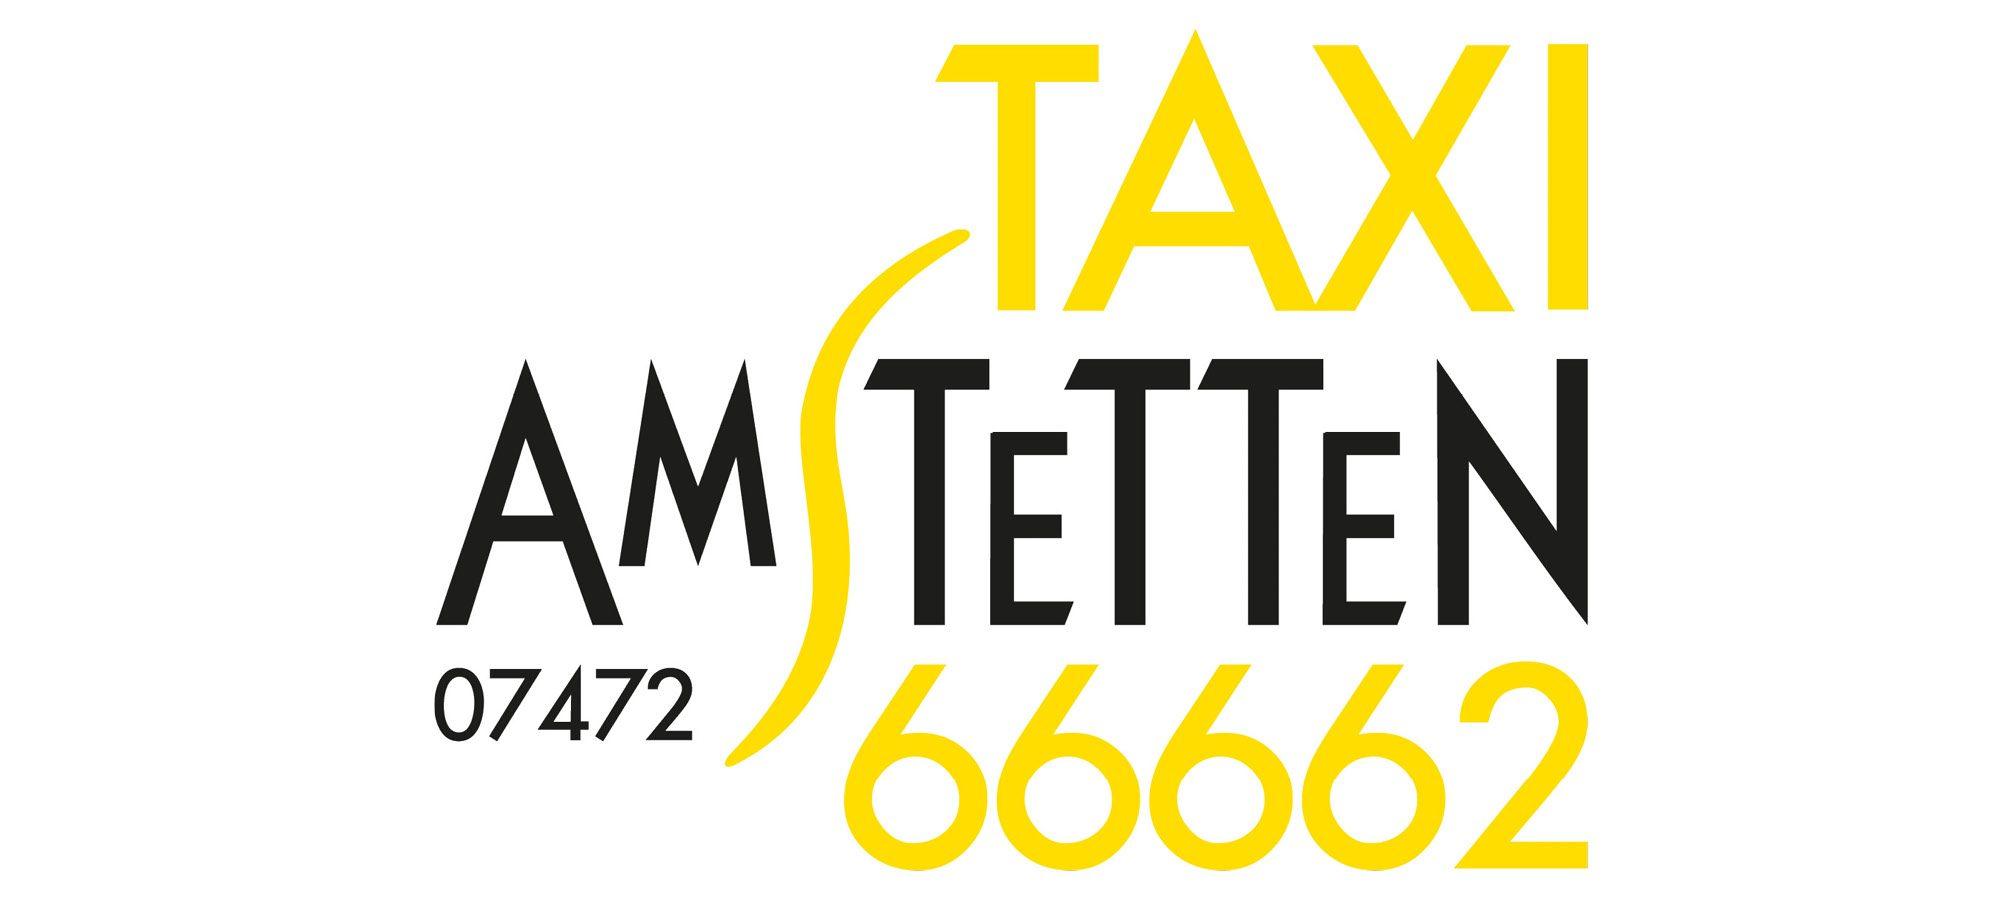 Taxi Amstetten Logo schwarz